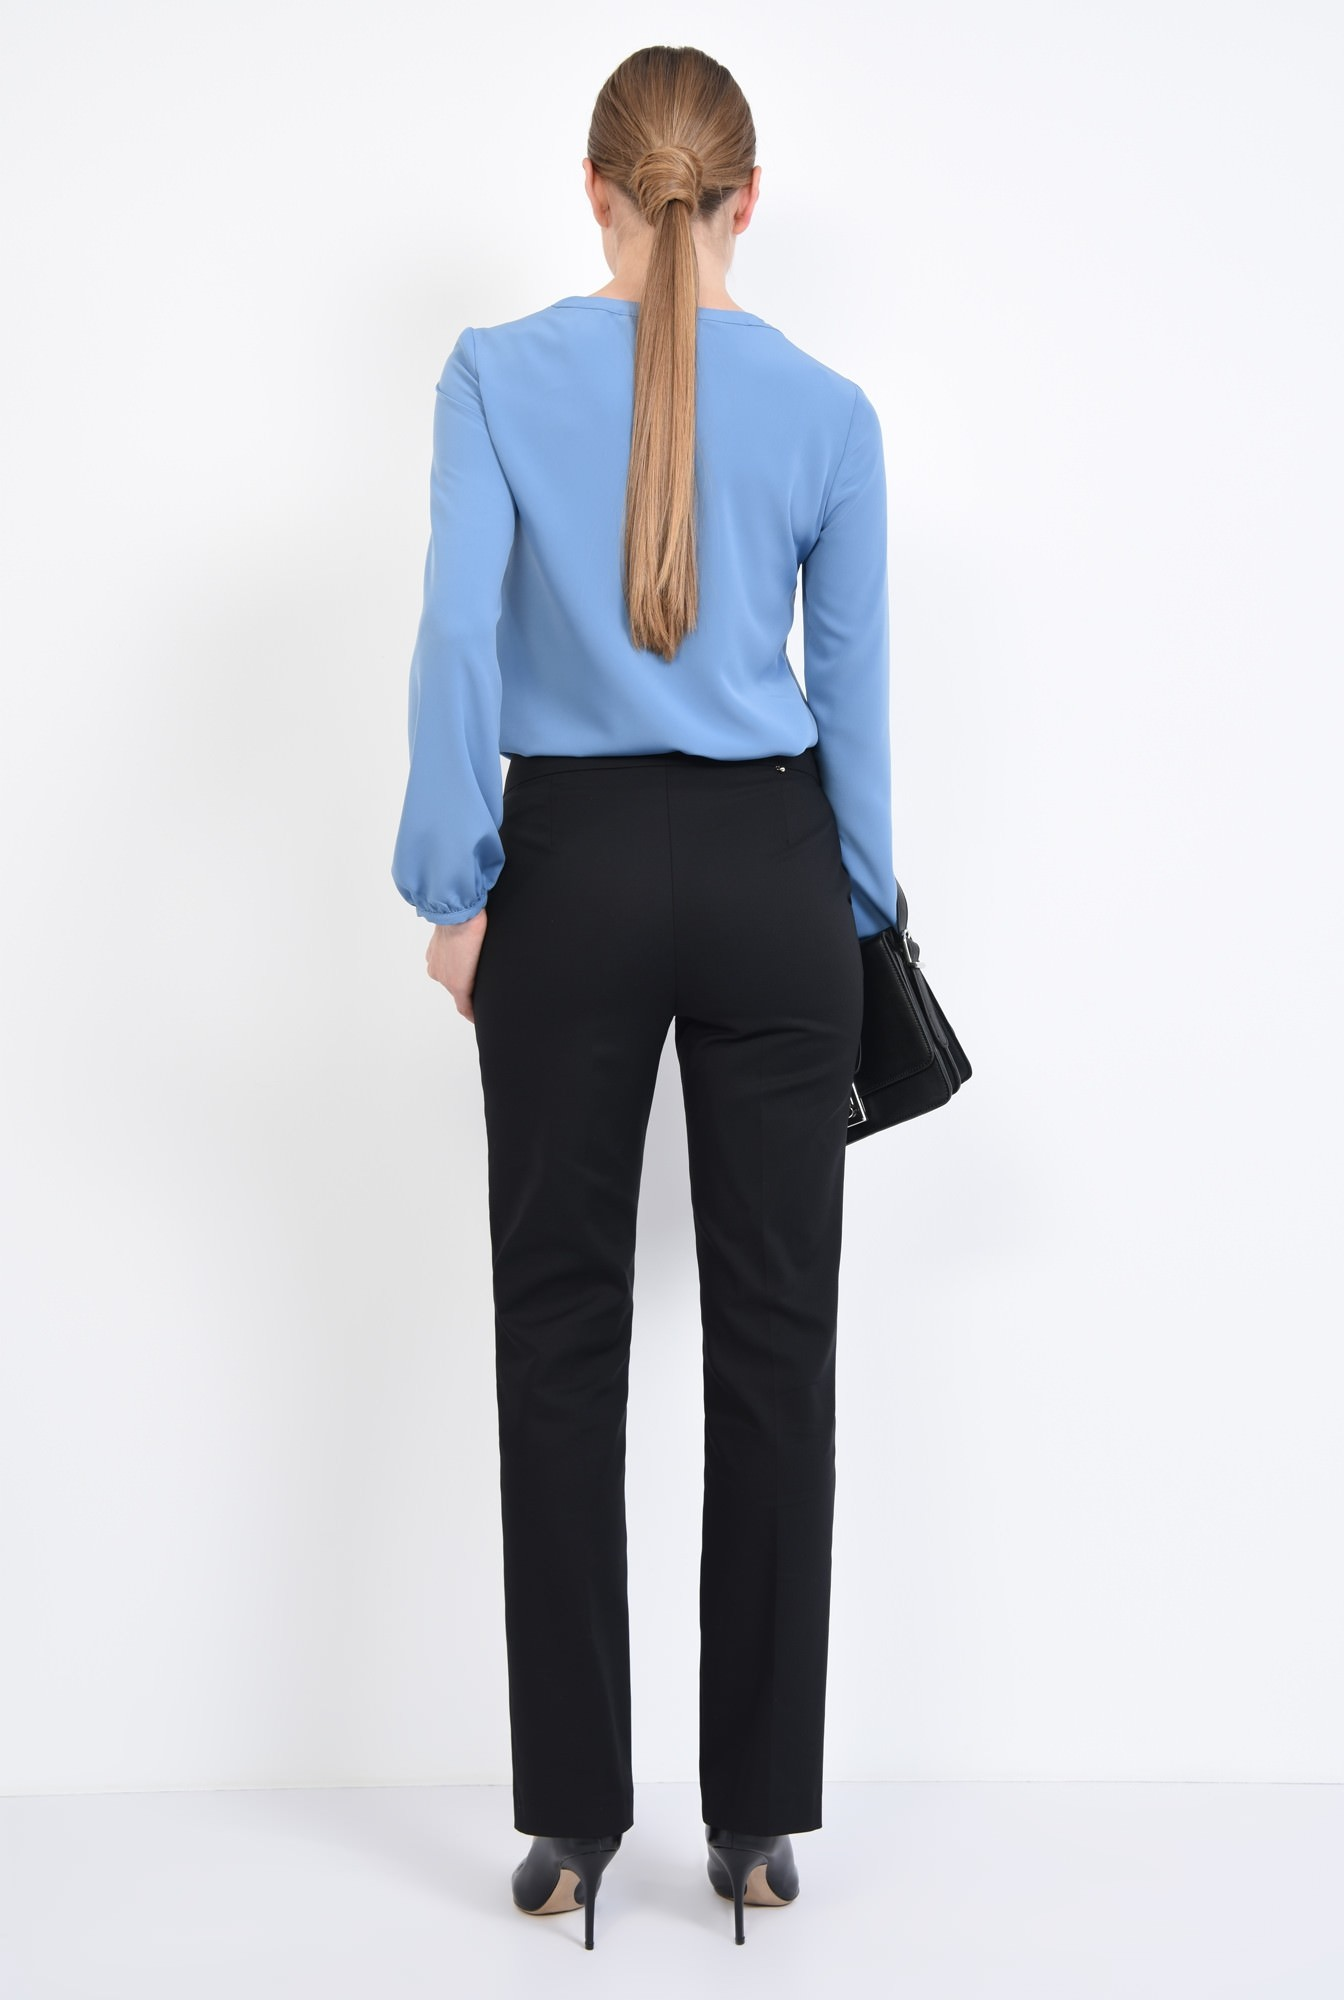 1 - 360 - Bluza casual, bleu, maneci lungi